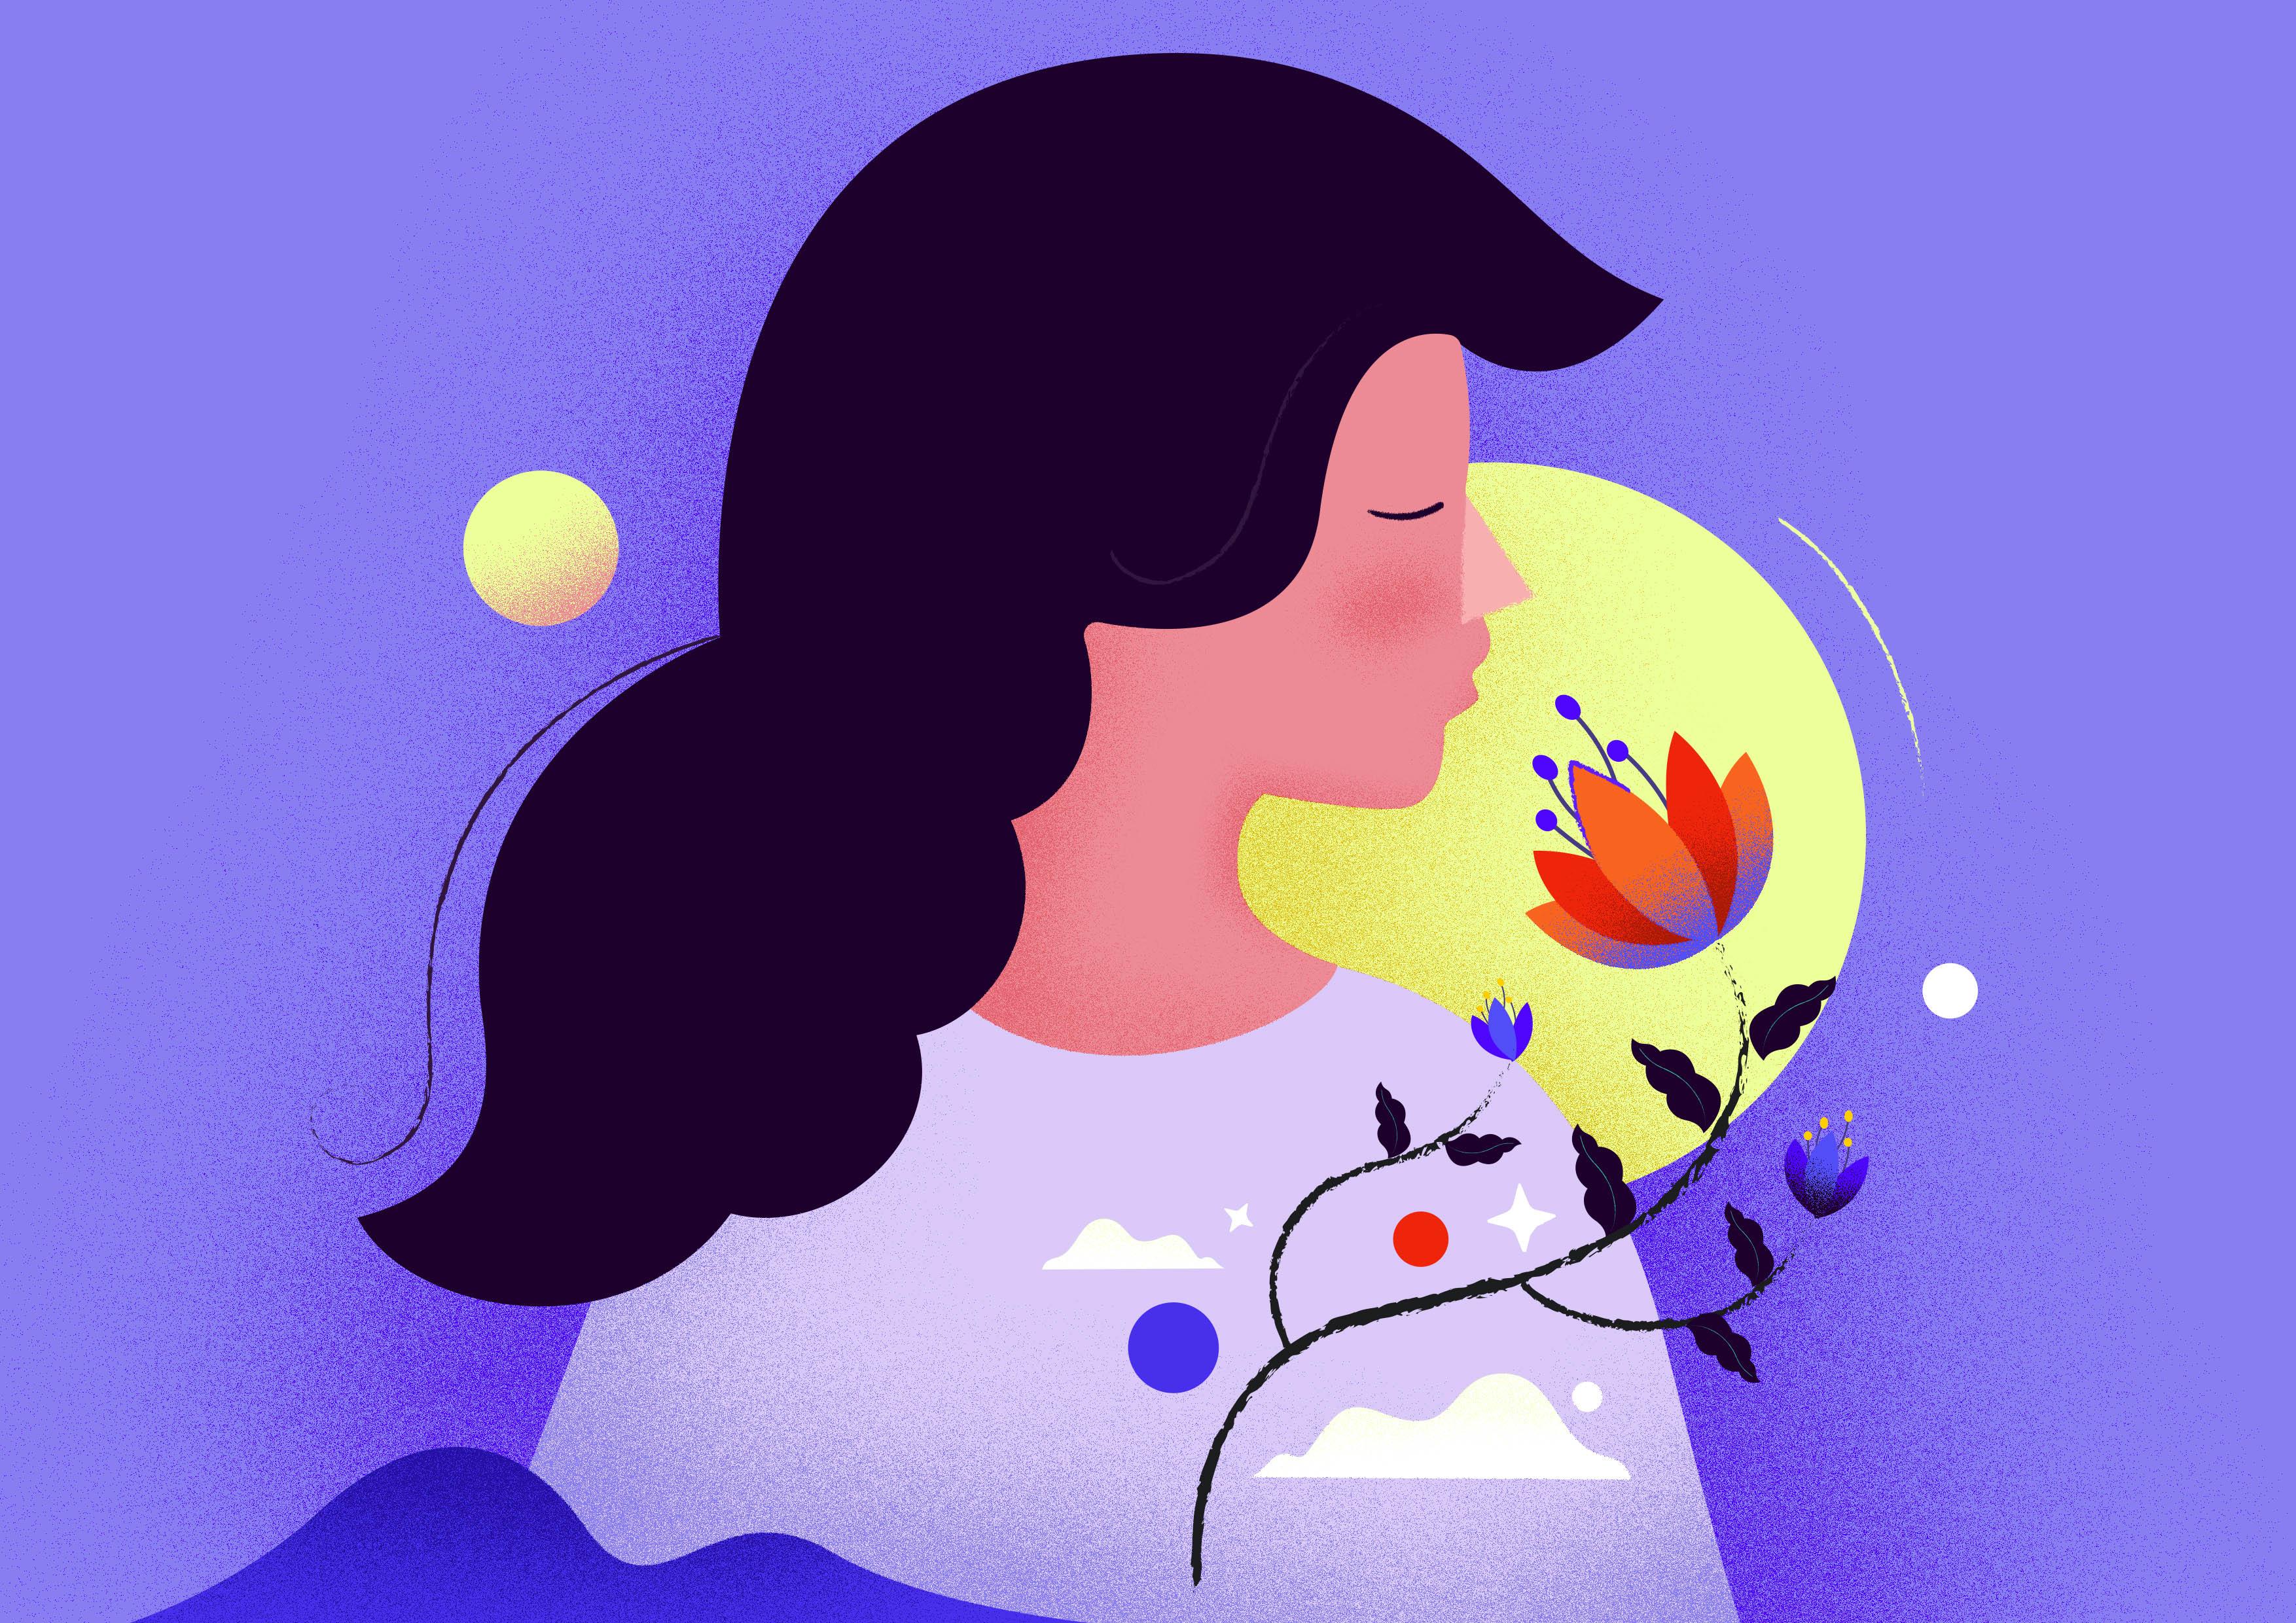 Illustration_16_texured.jpg